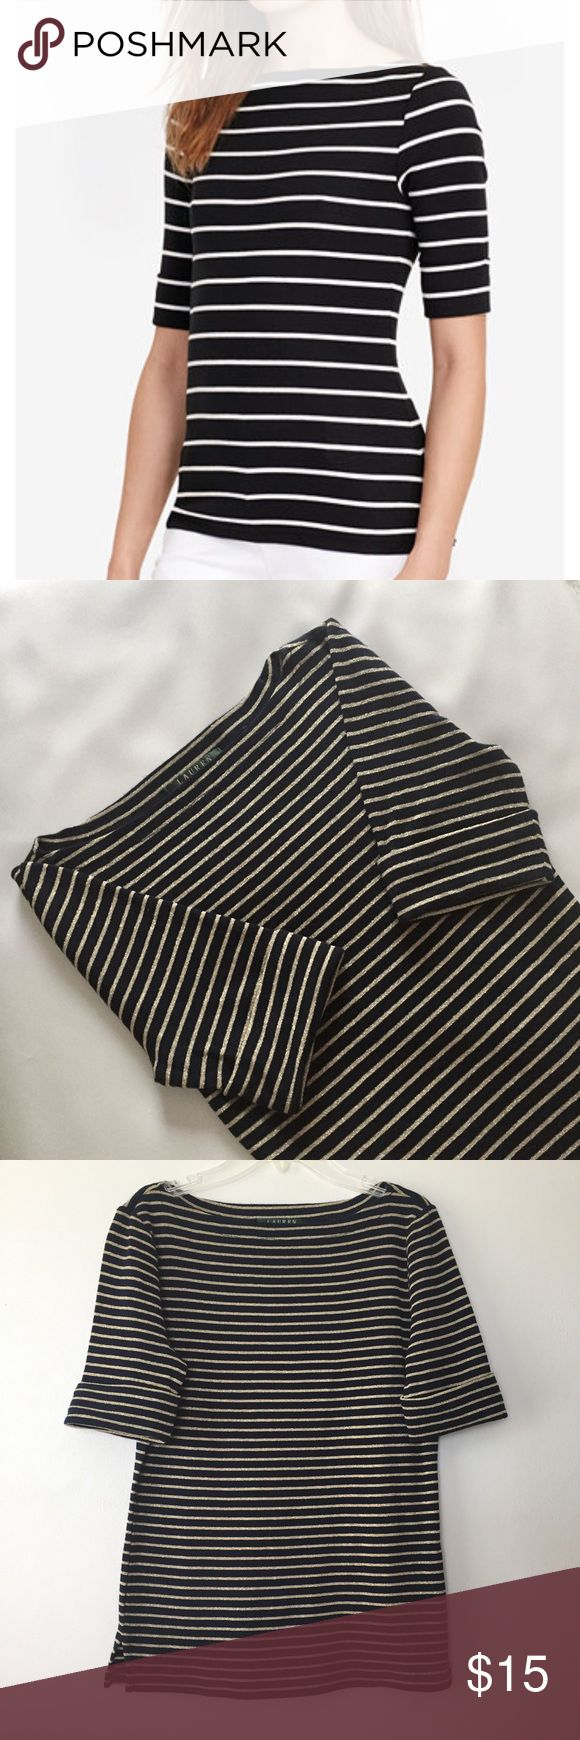 ❗️Ralph Lauren bateau shirt❗️ A bateau neckline, dark blue/gold color and a slim fit define this LRL T-shirt's sleek style. Elbow-length sleeves with fold-over cuffs. Bust 34. Length 23. Lauren Ralph Lauren Tops Tees - Short Sleeve